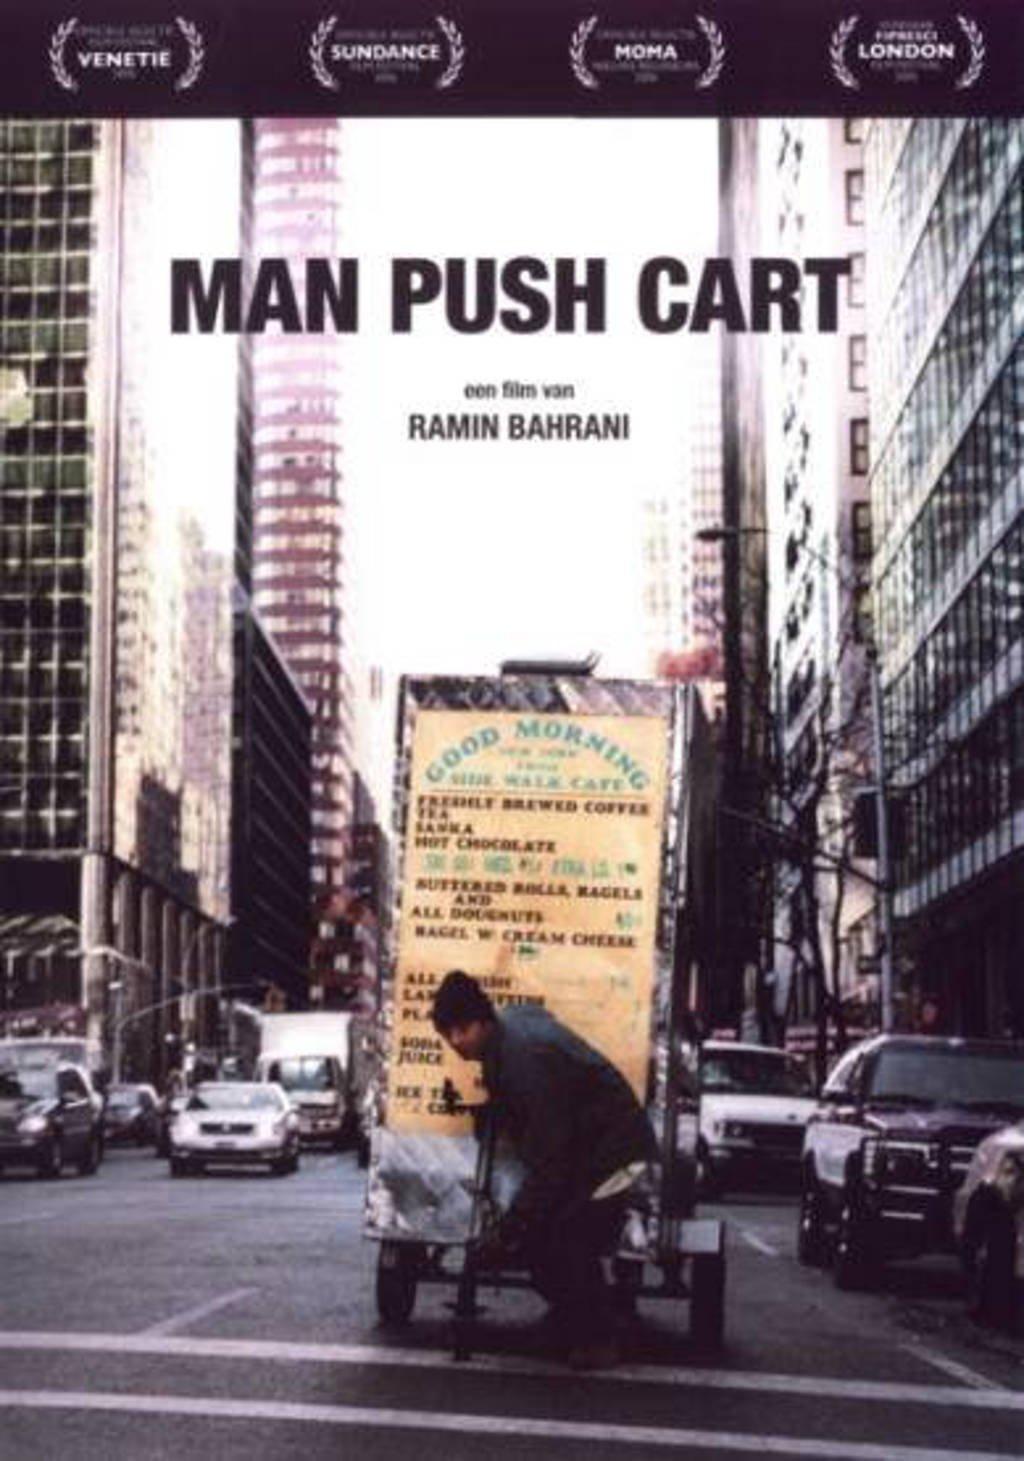 Man push cart (DVD)